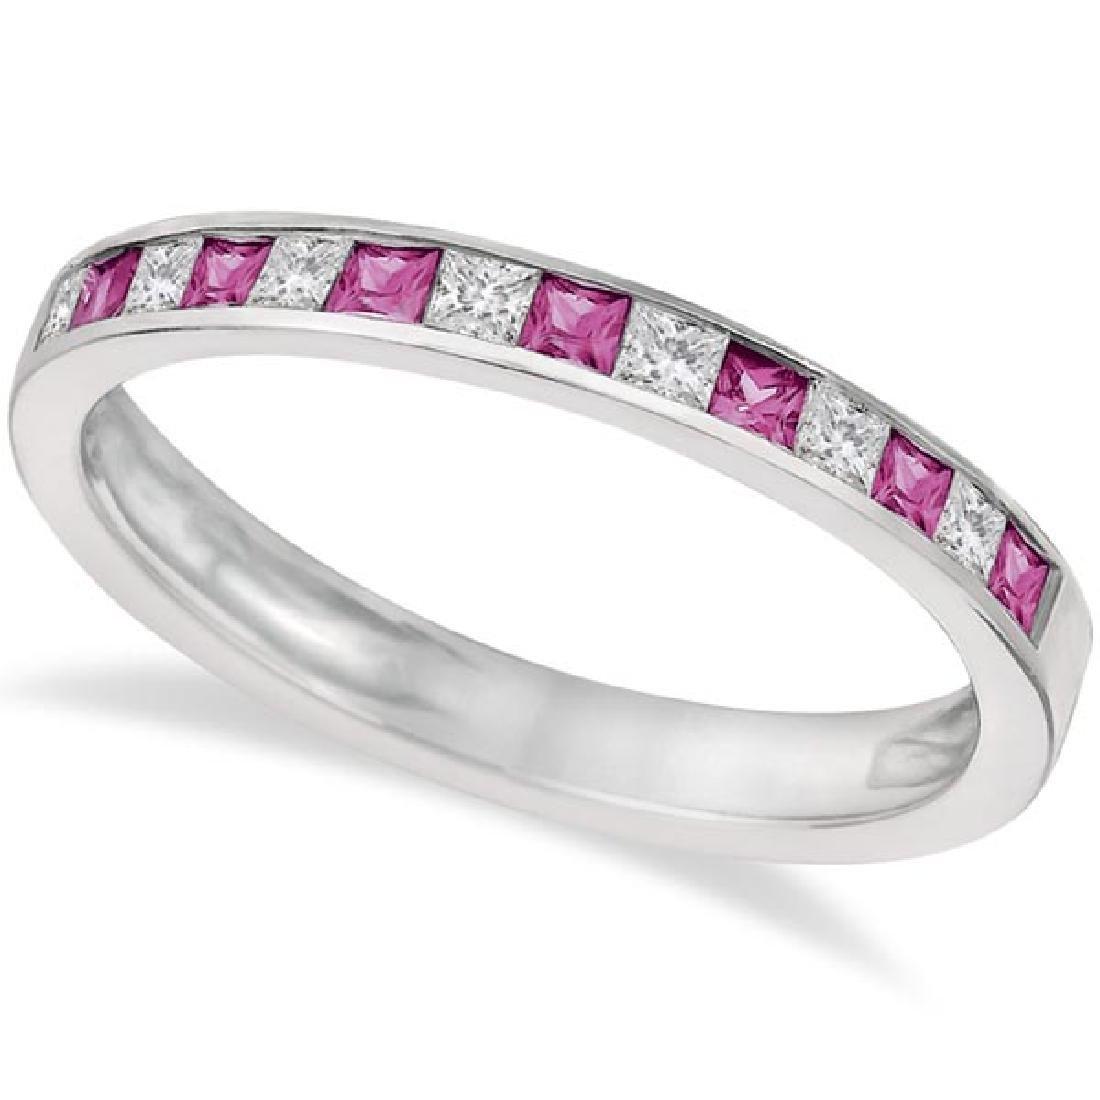 Princess Cut Diamond and Pink Sapphire Ring Band 14k Wh